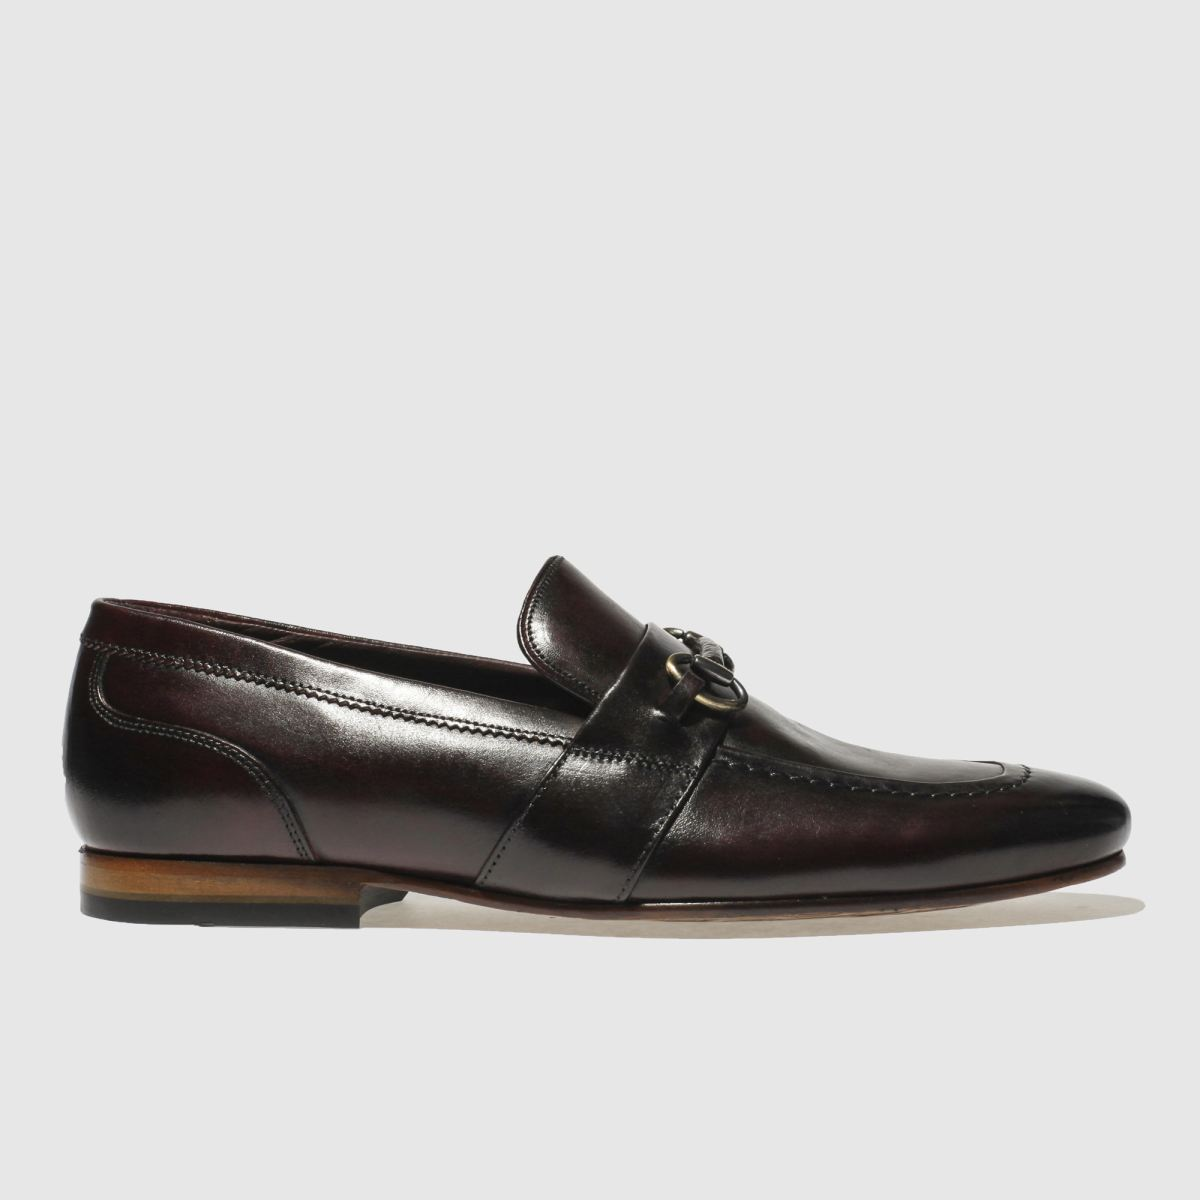 Ted Baker Burgundy Daiser Shoes